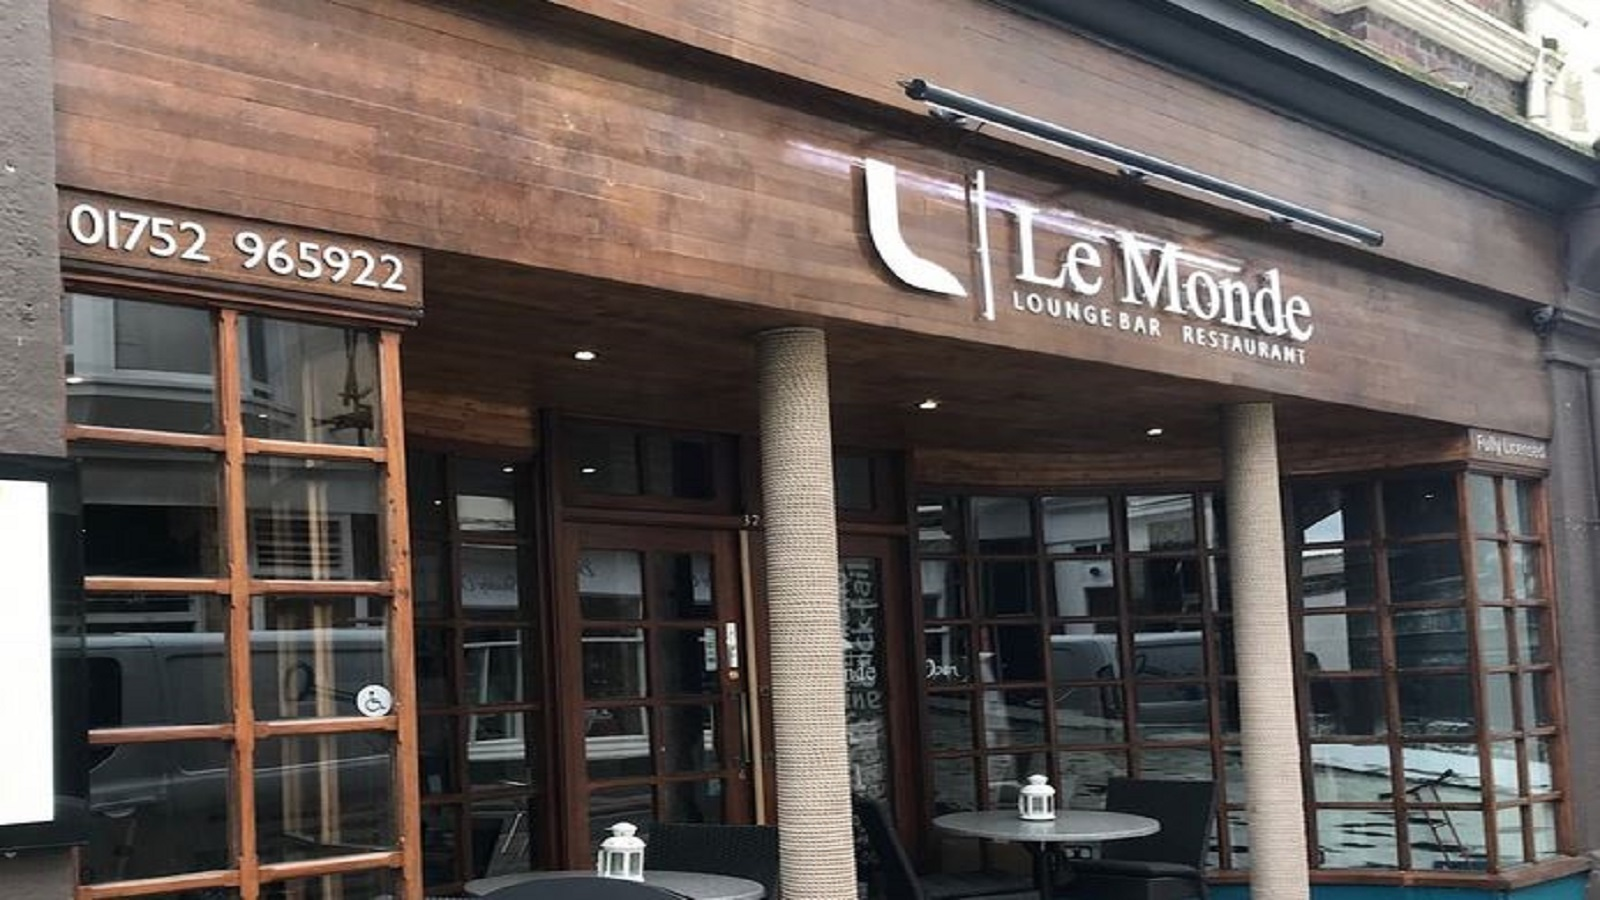 Le Monde Lounge